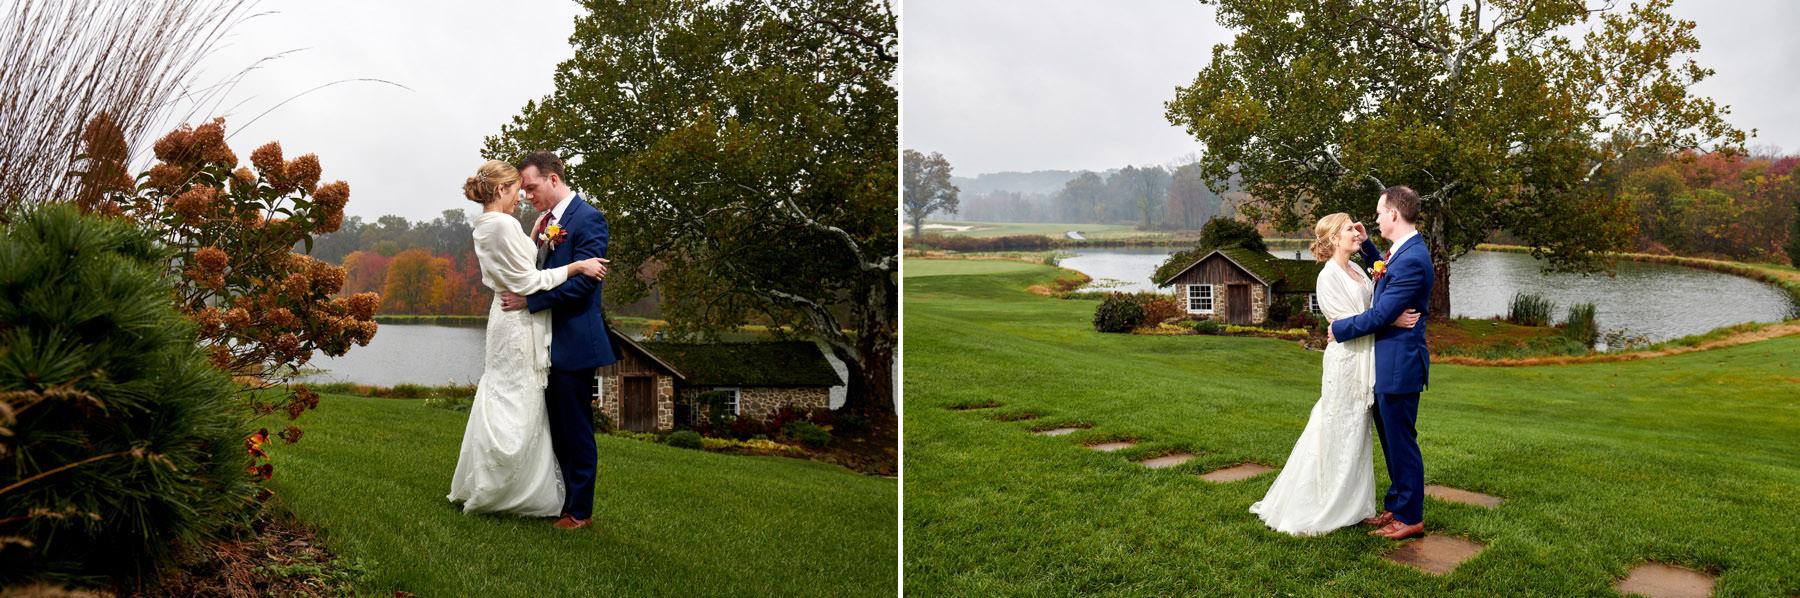 rainy sunset wedding photos at French Creek Golf Club